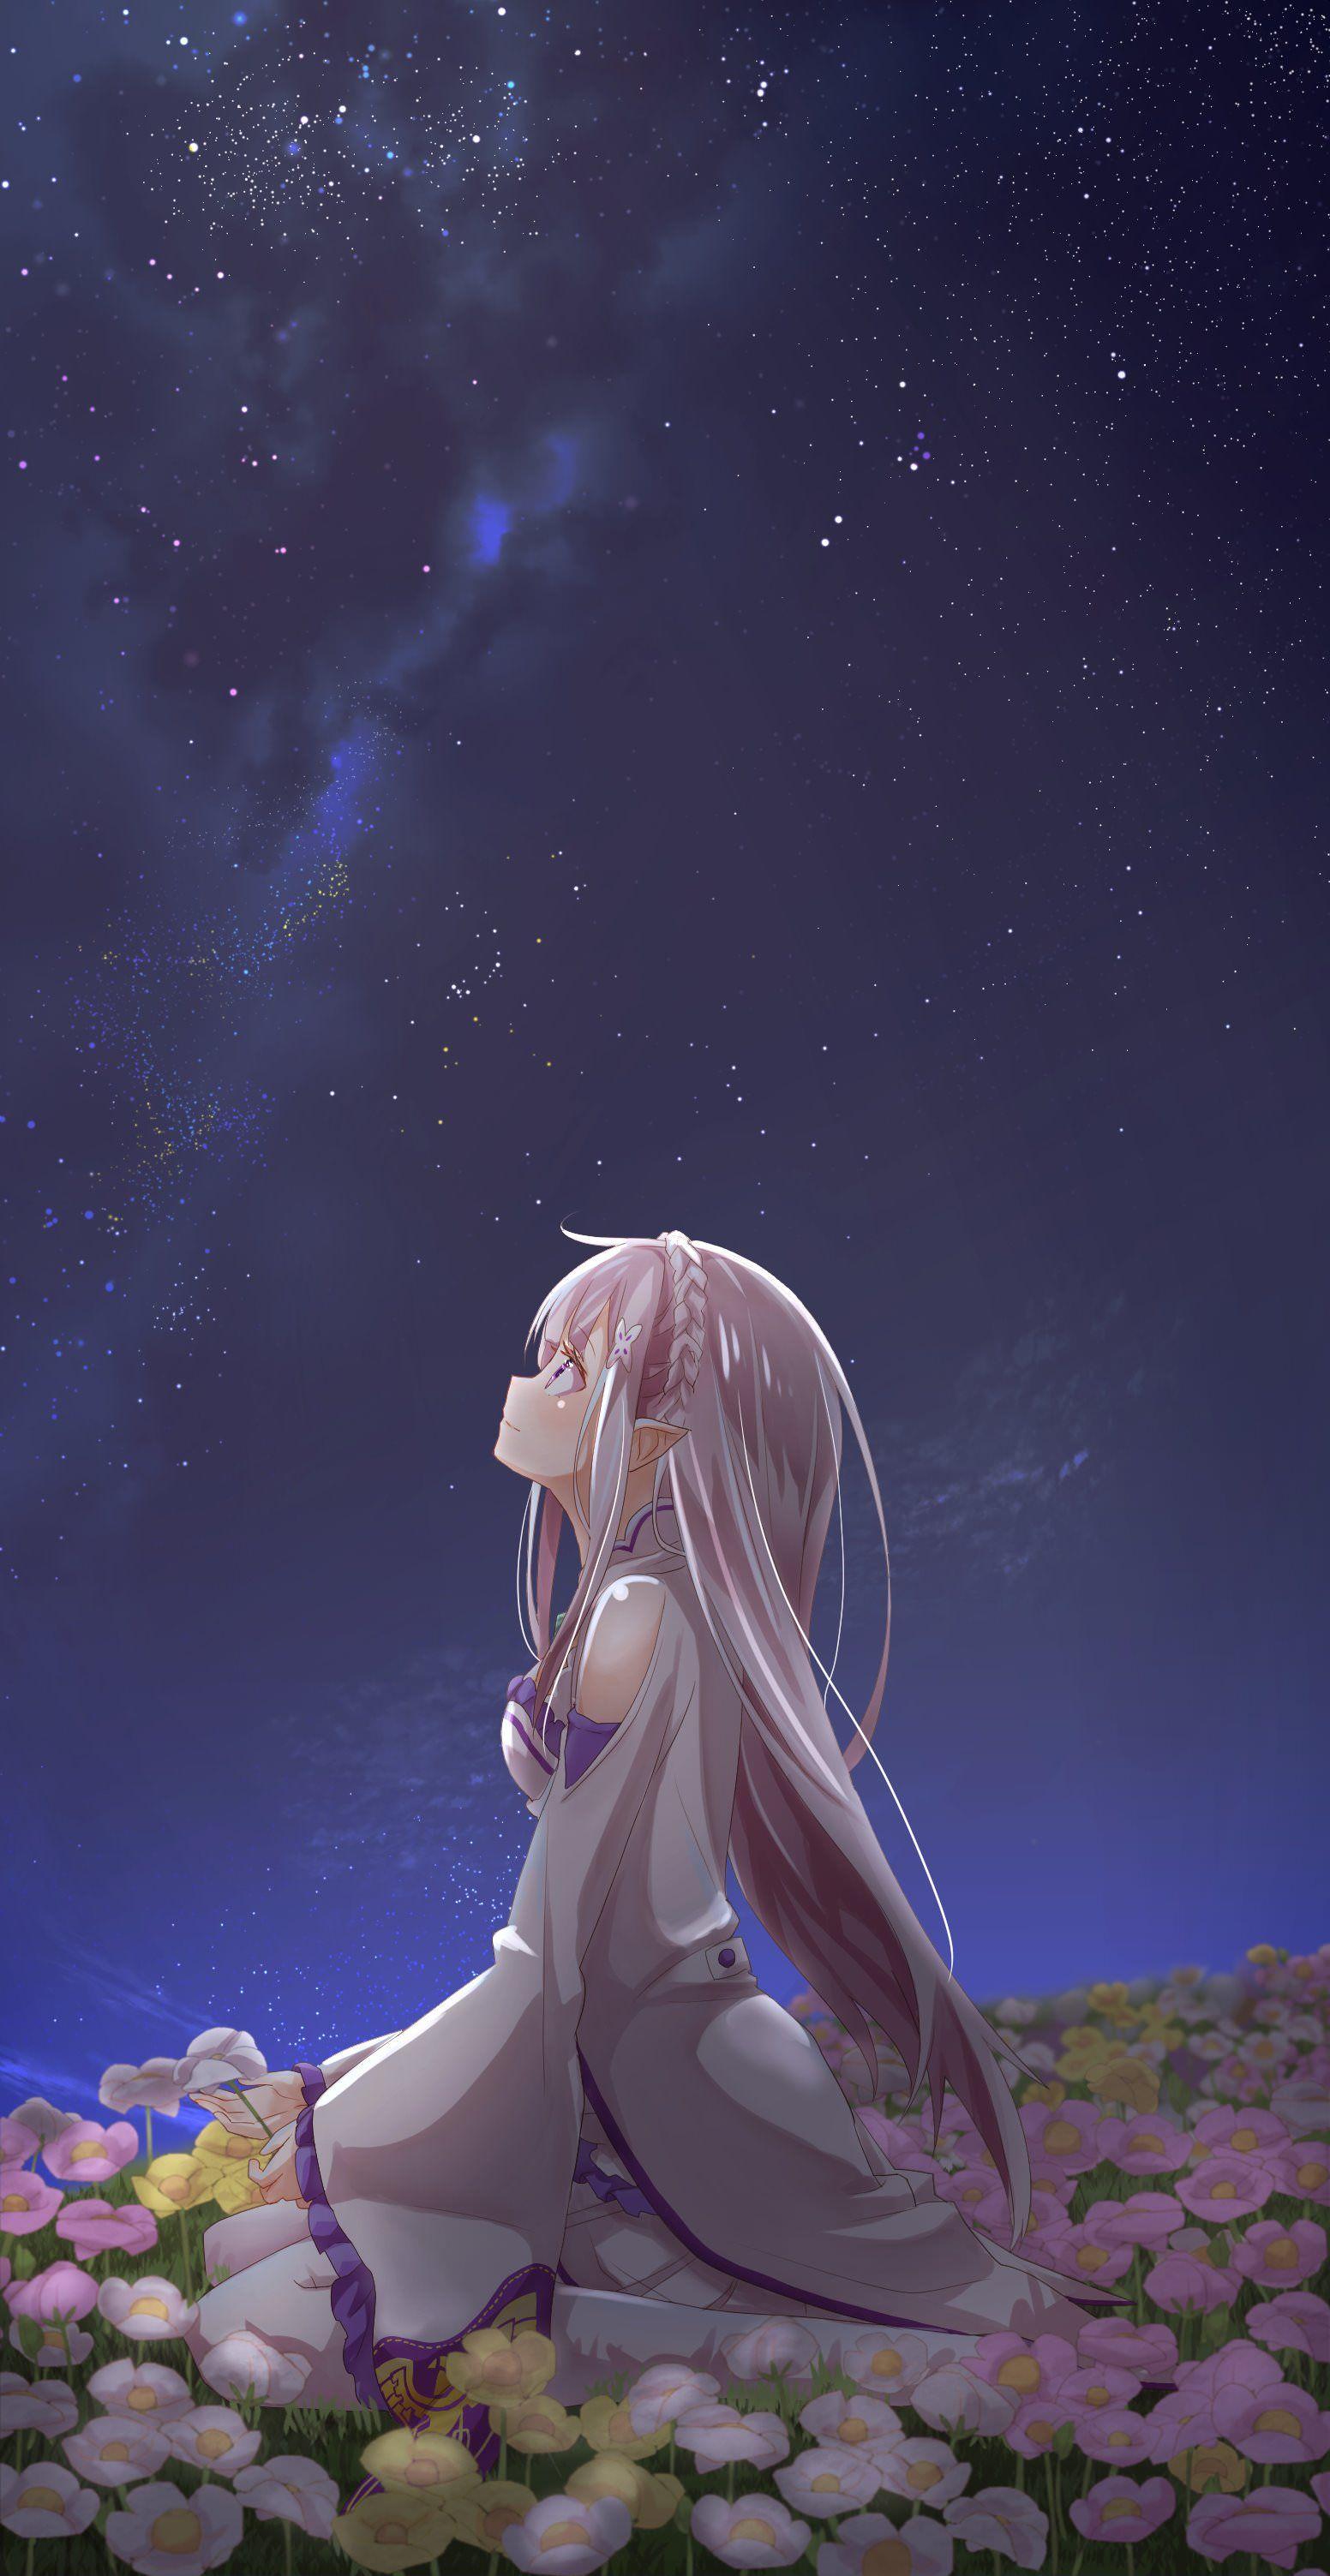 1552x3007 Anime iPhone Wallpaper HD Wallpaper in 2020 Anime 1552x3007